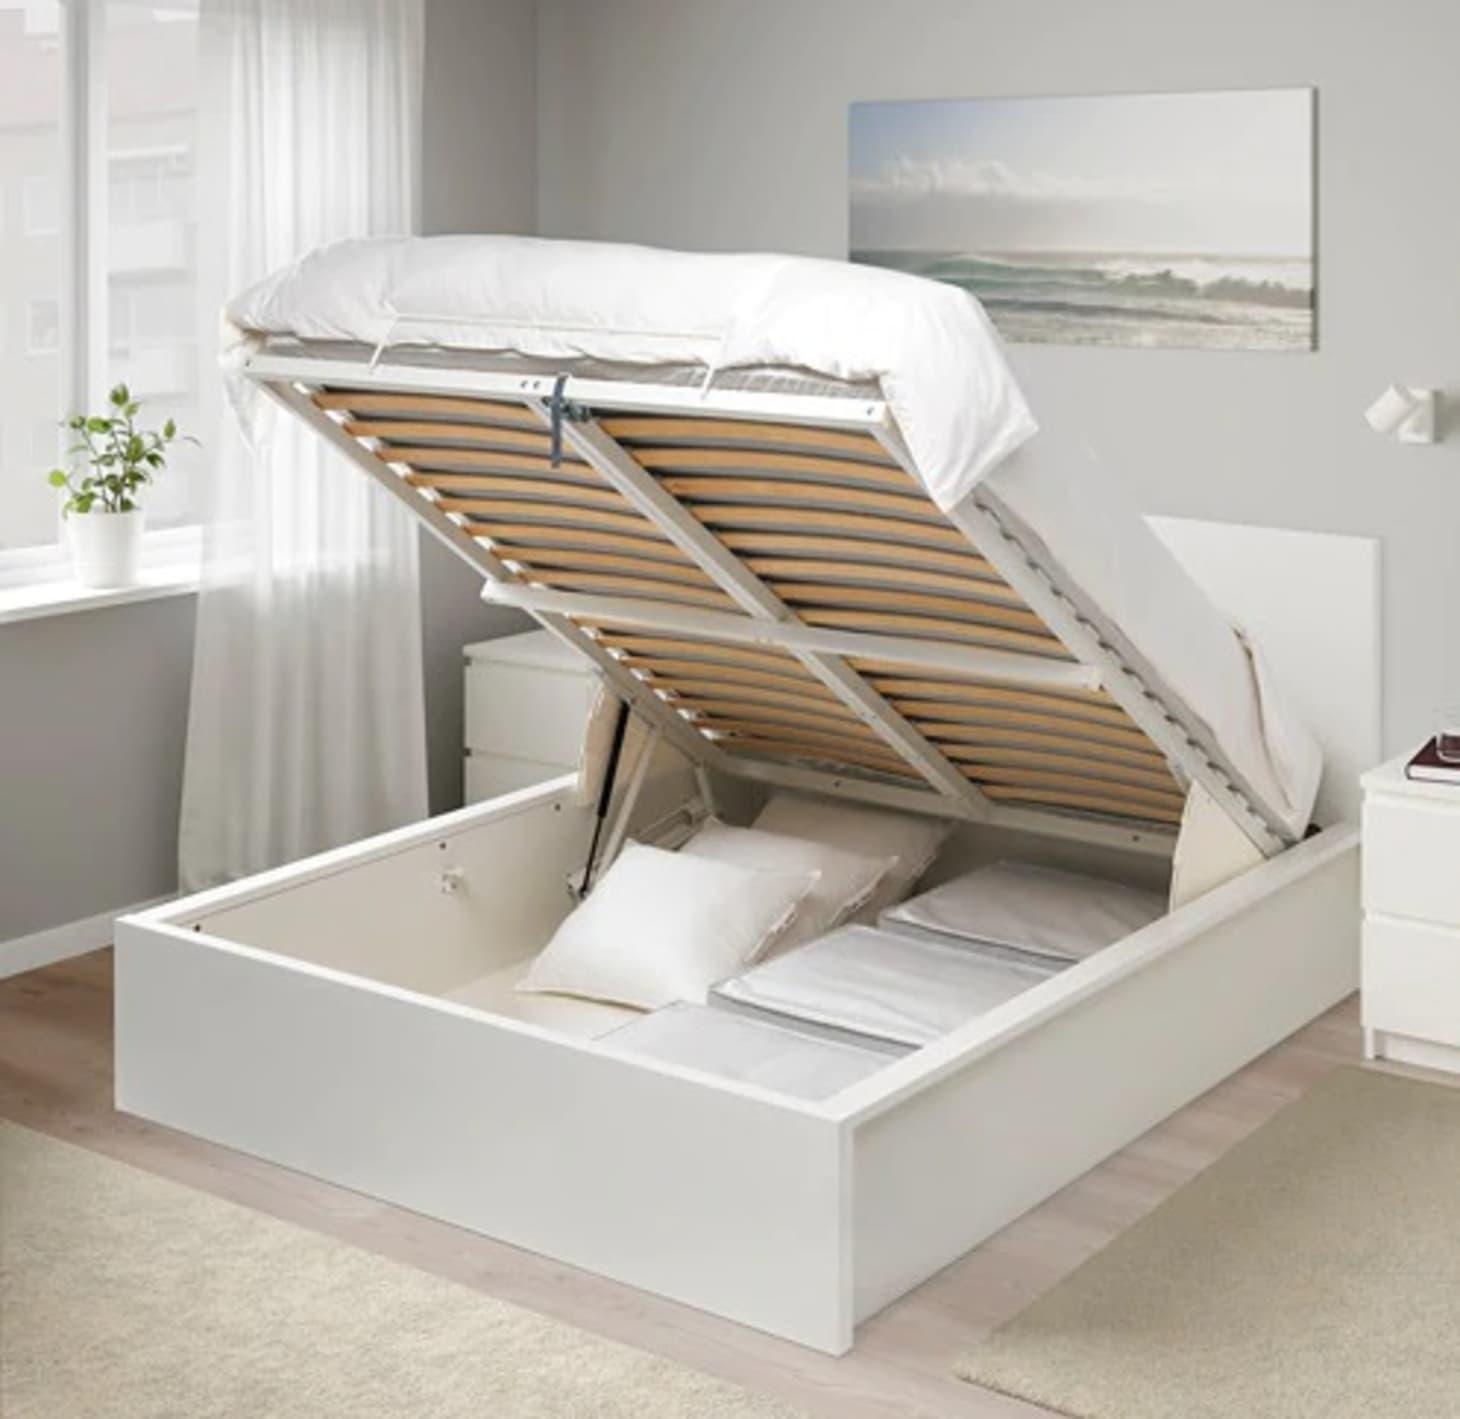 Fine Stylish Storage Items For Homes With Zero Closets Inzonedesignstudio Interior Chair Design Inzonedesignstudiocom